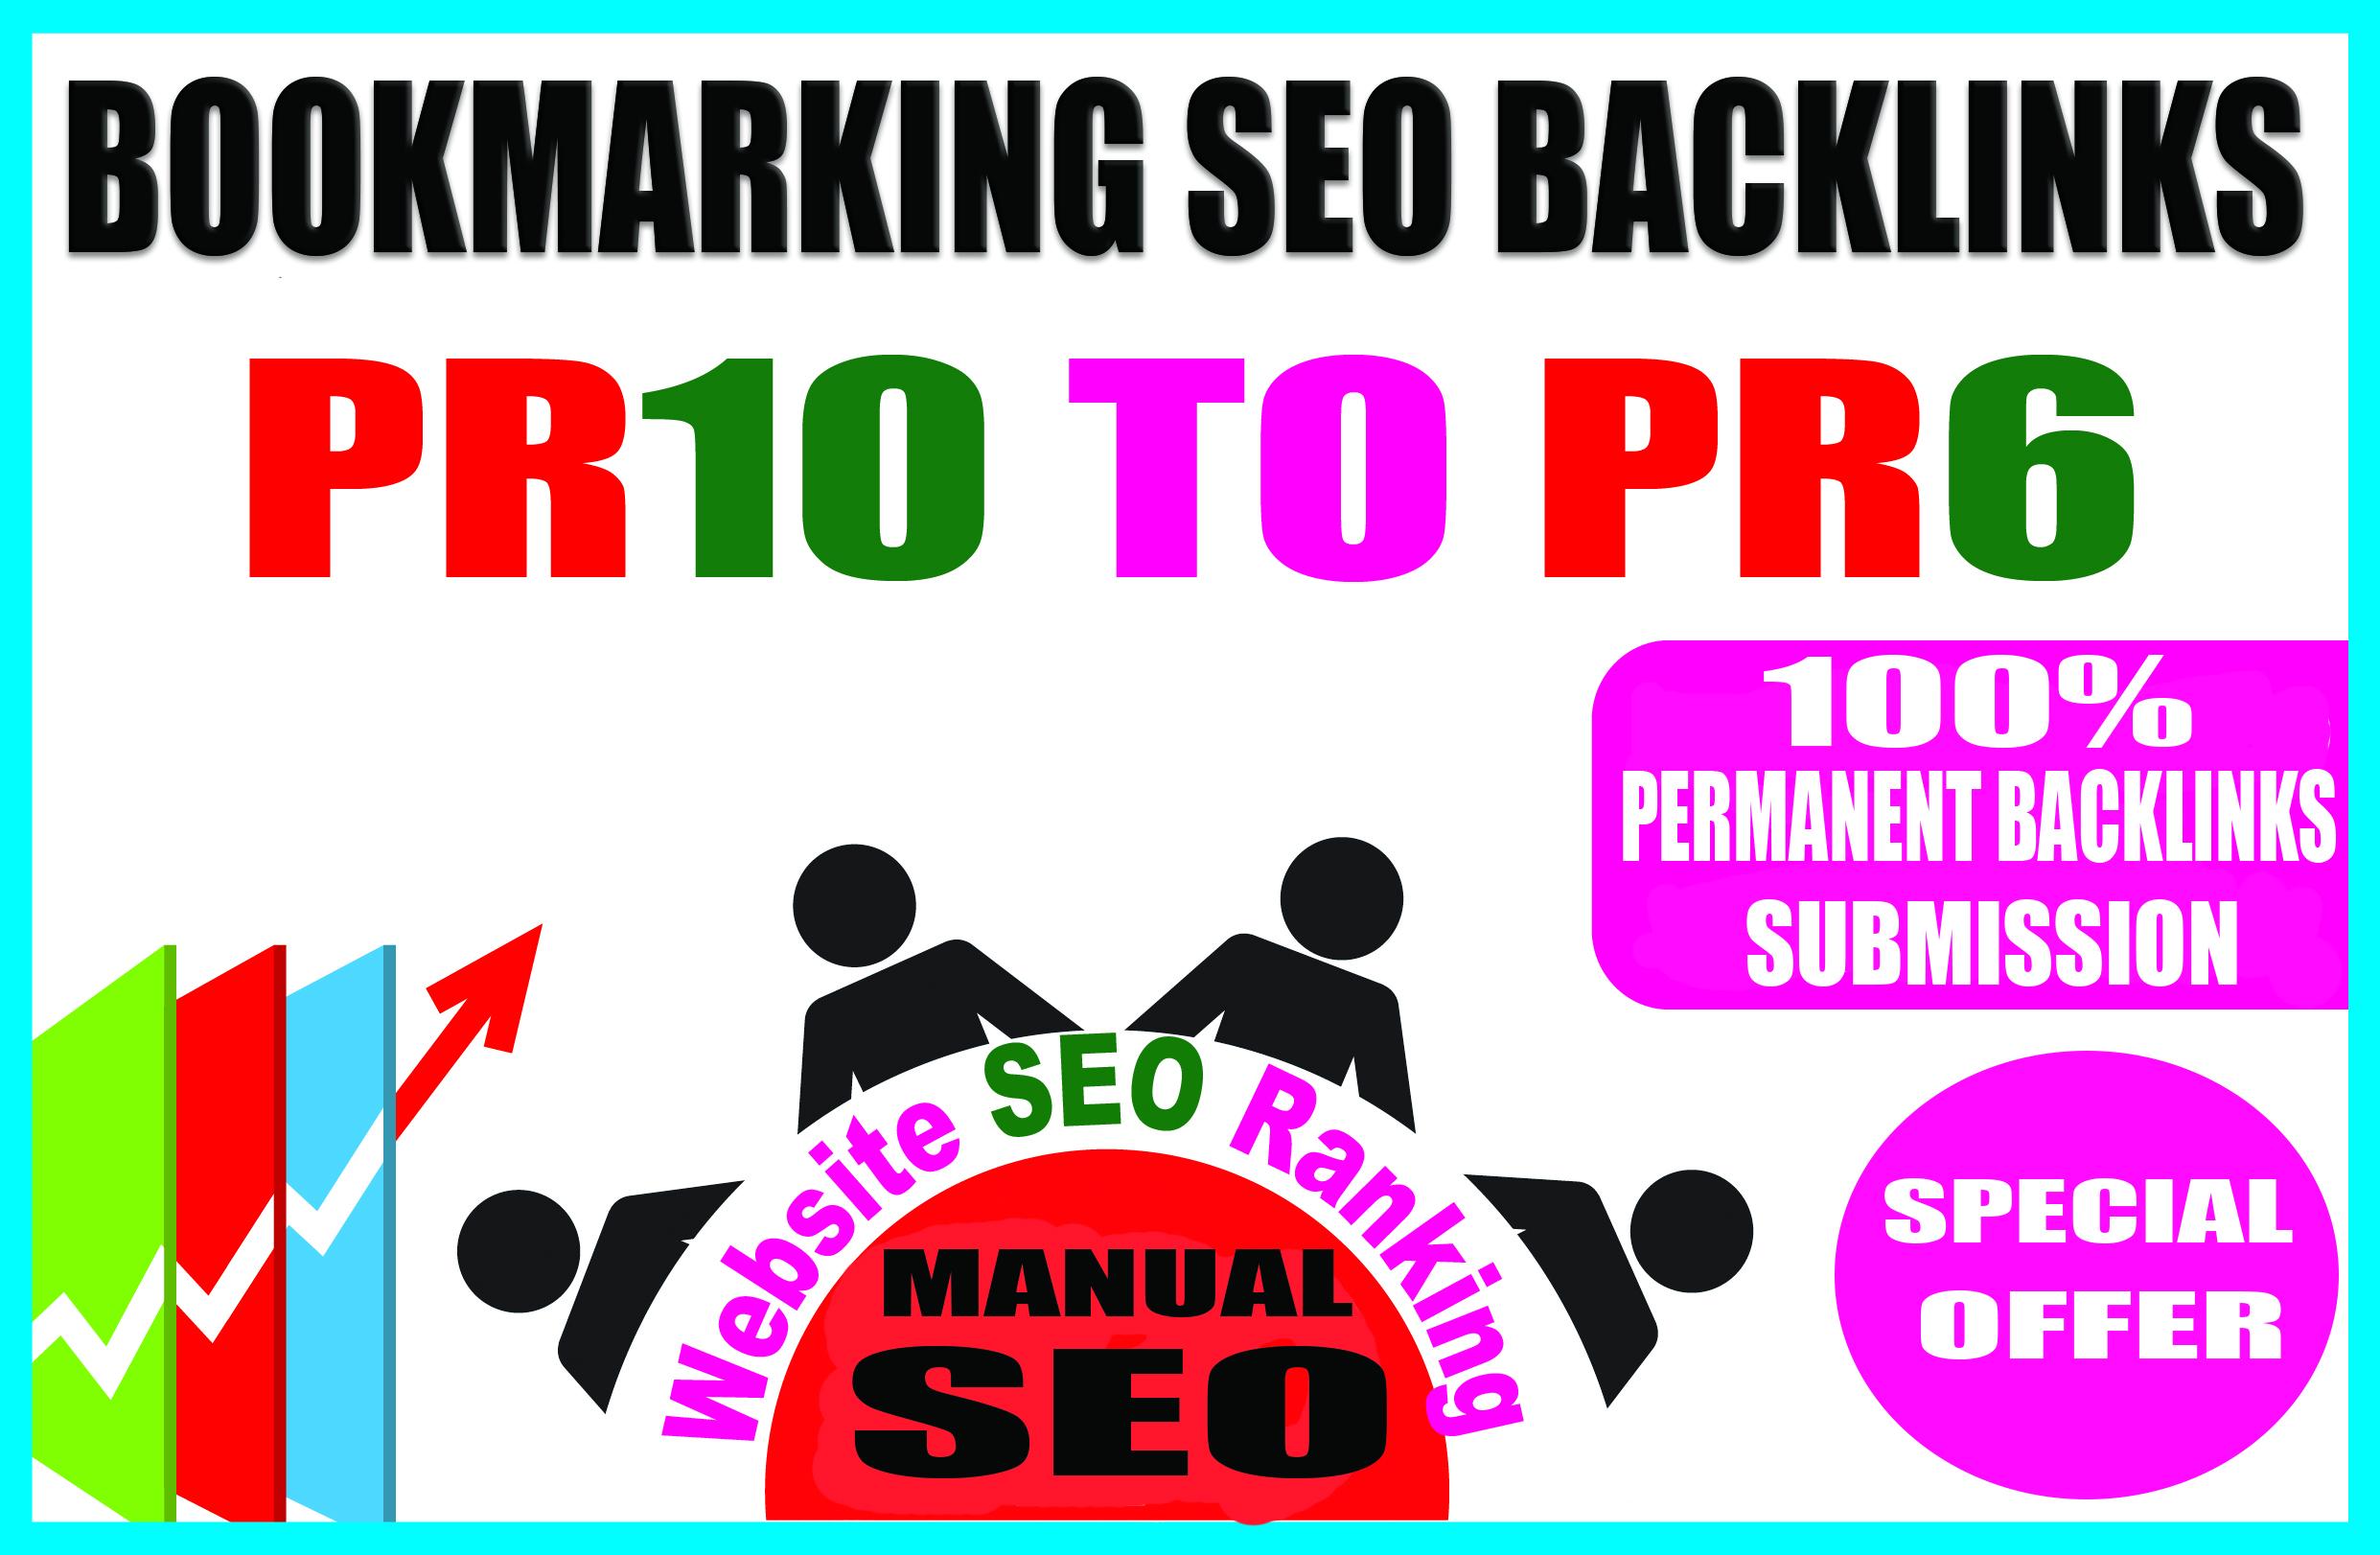 Create Top 50 Manual Social Bookmarking Backlinks